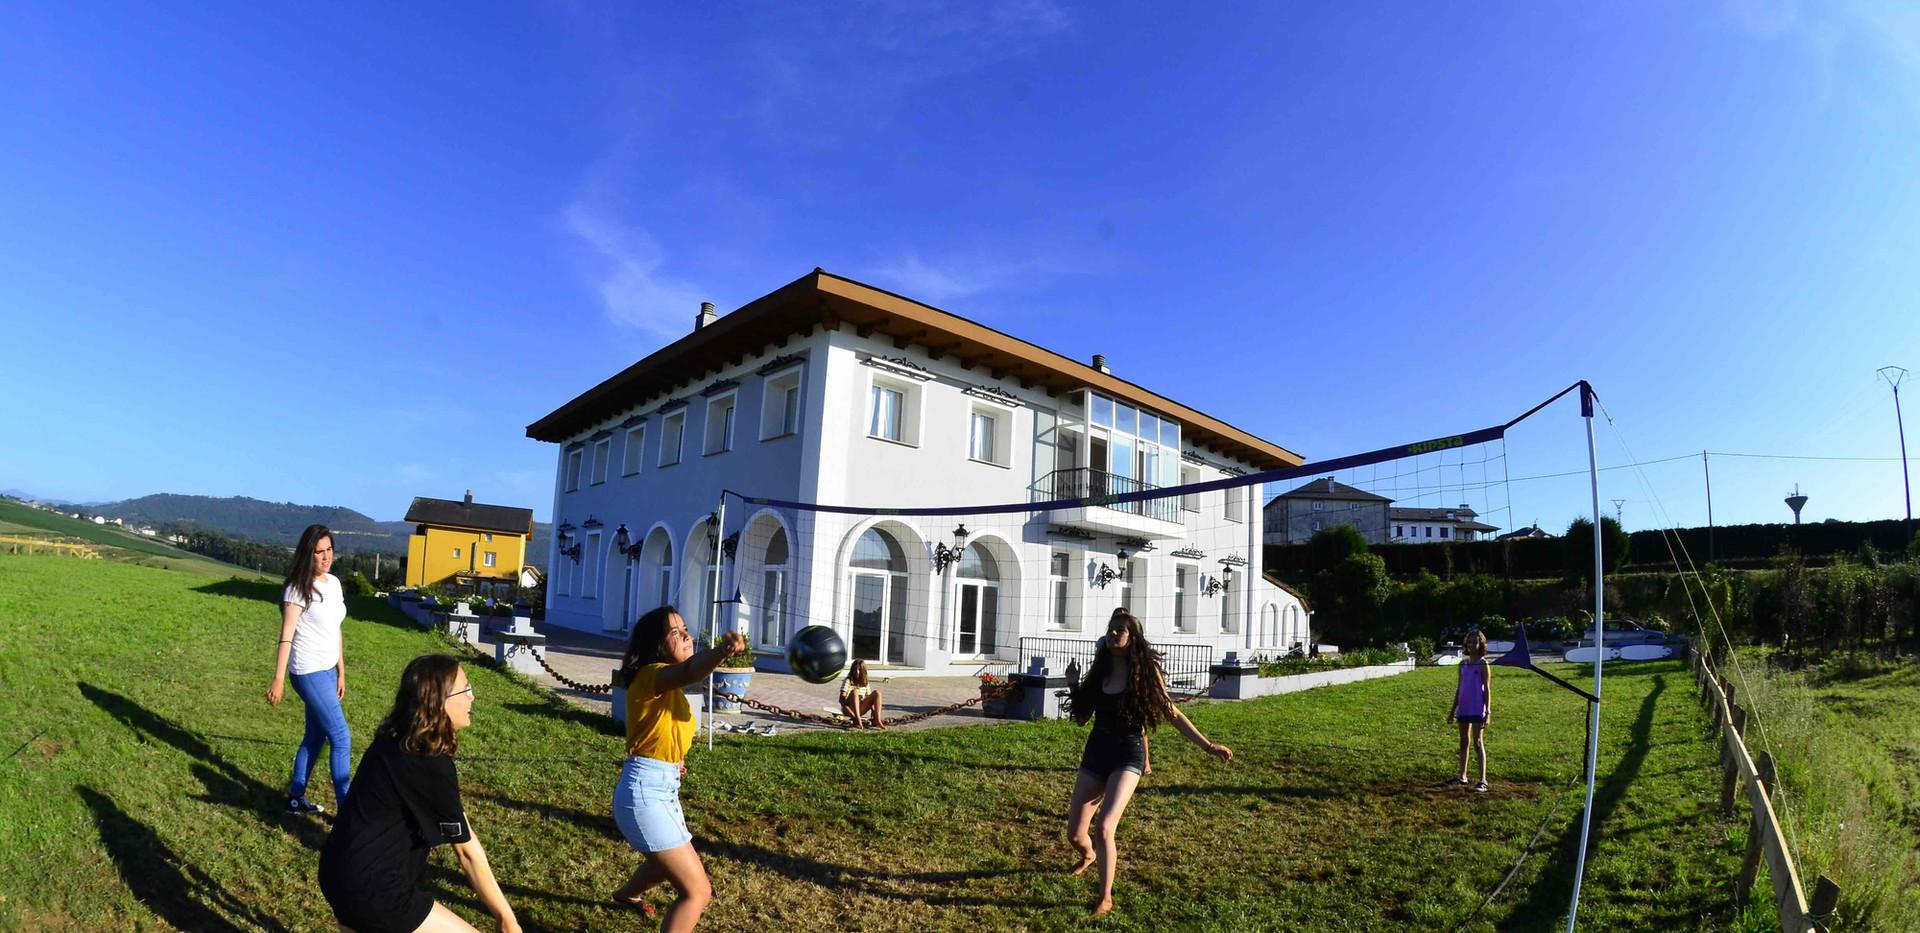 volley-almasurfhouse